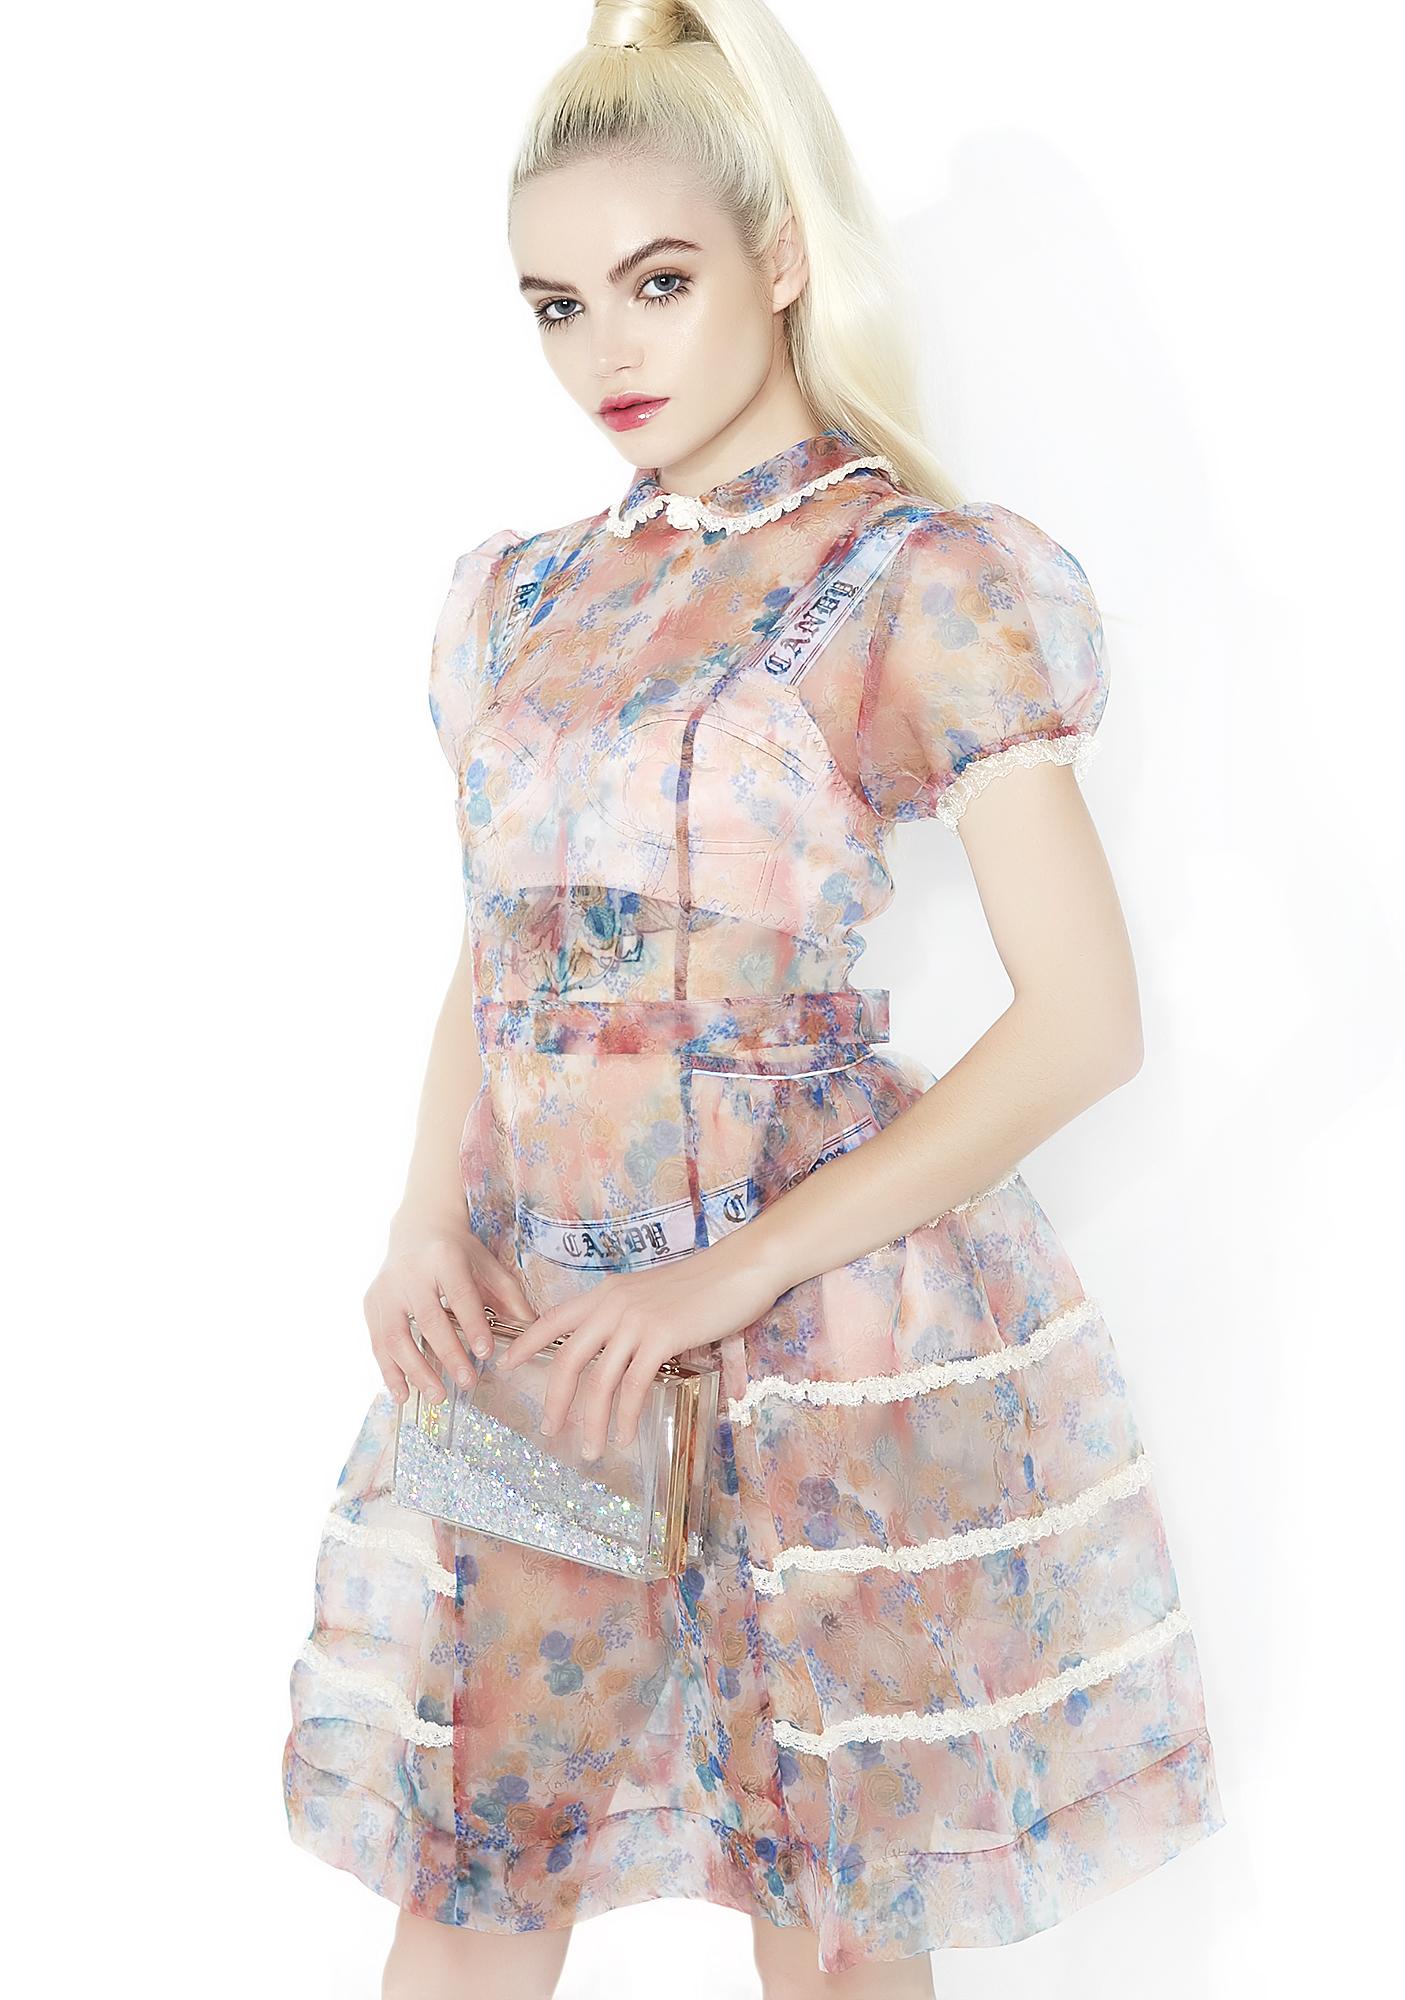 Sugar Thrillz Rococo Rose Sheer Dress